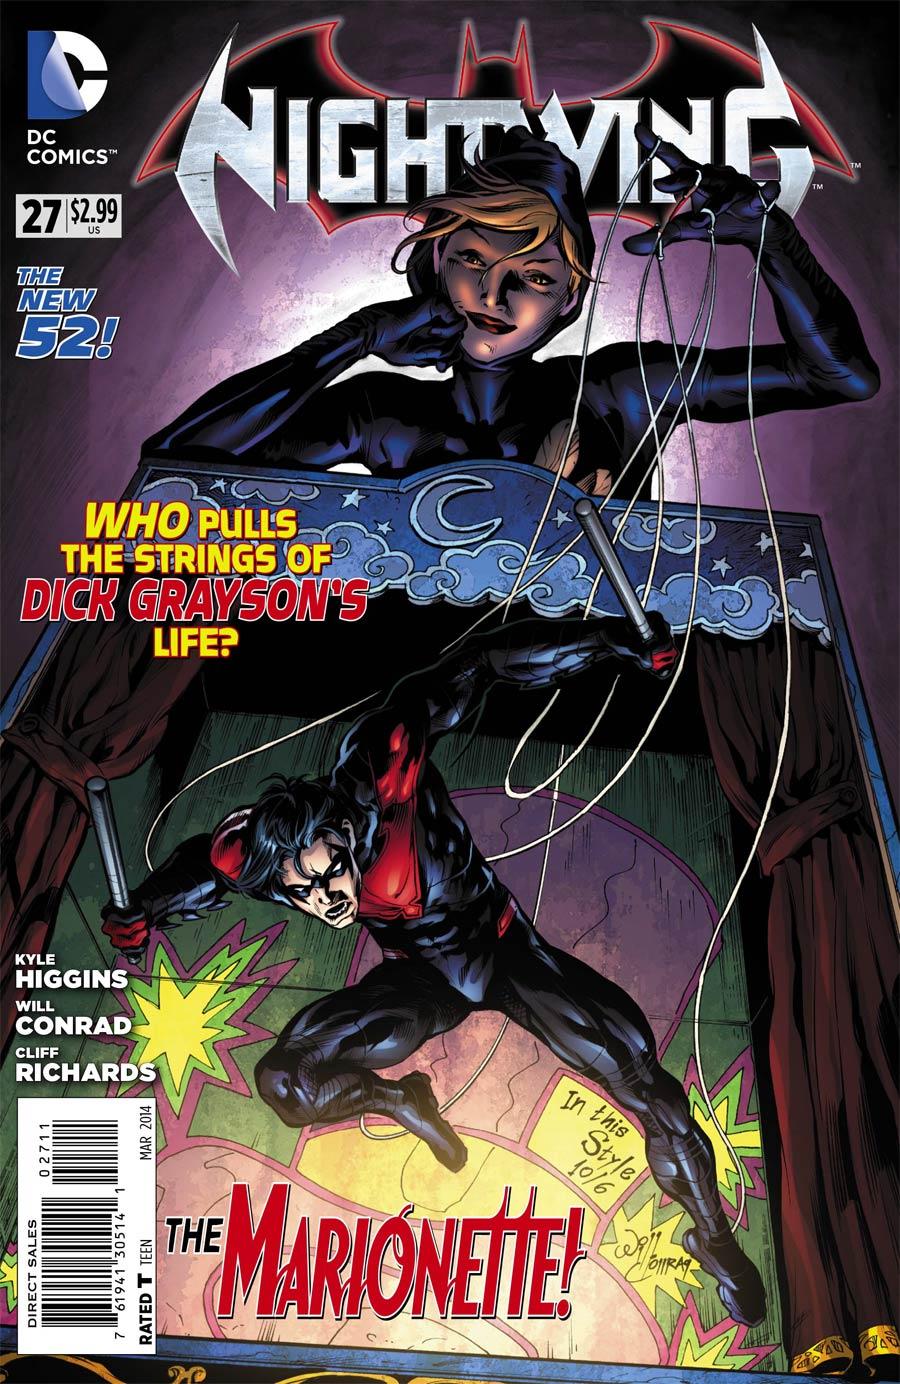 Nightwing Vol 3 #27 Cover A Regular Will Conrad Cover